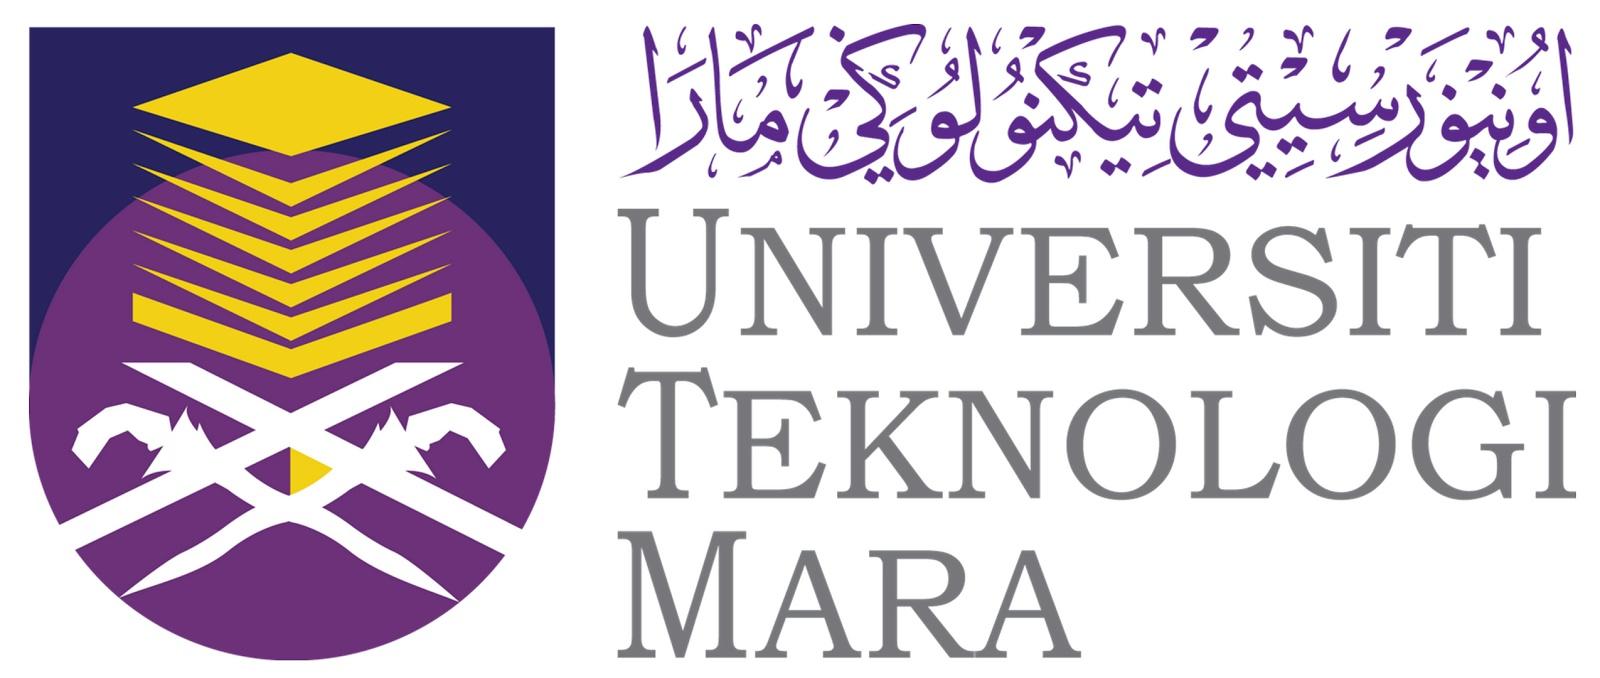 Permohonan UiTM 2016/2017 Sesi Akademik 2 Online